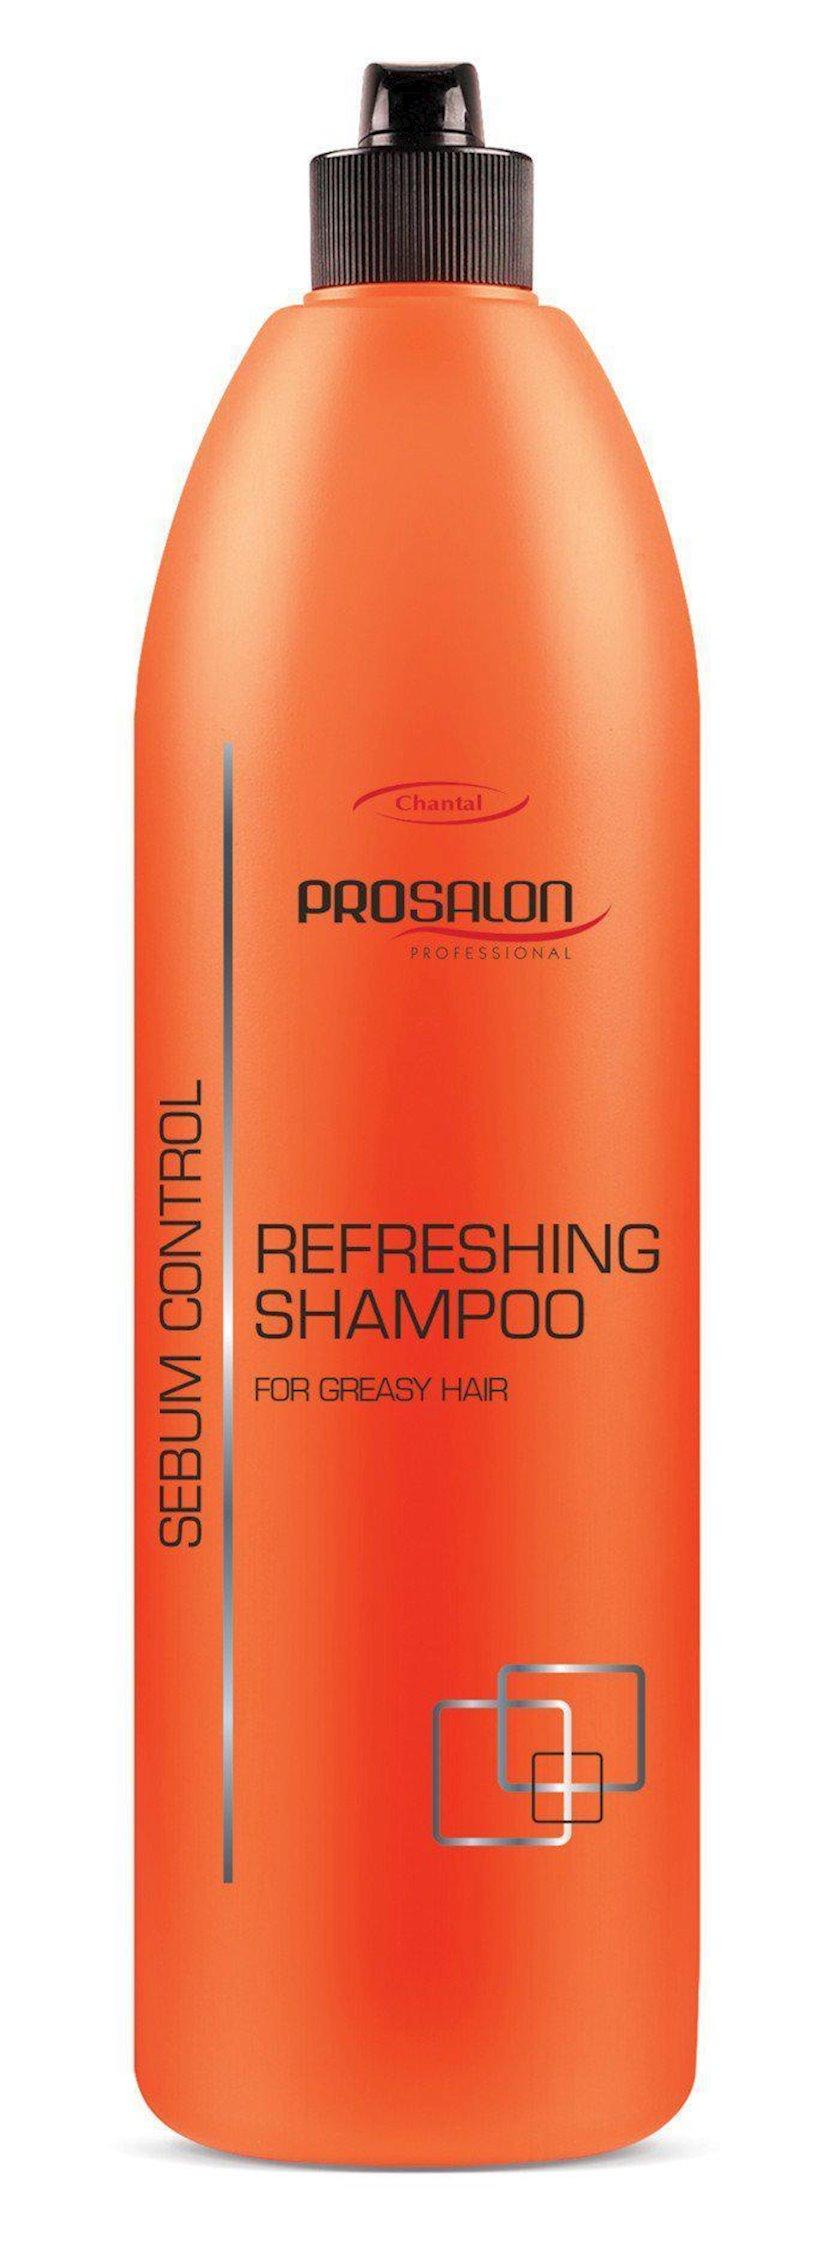 Şampun Prosalon Refreshing Hair Shampoo, 1000 ml